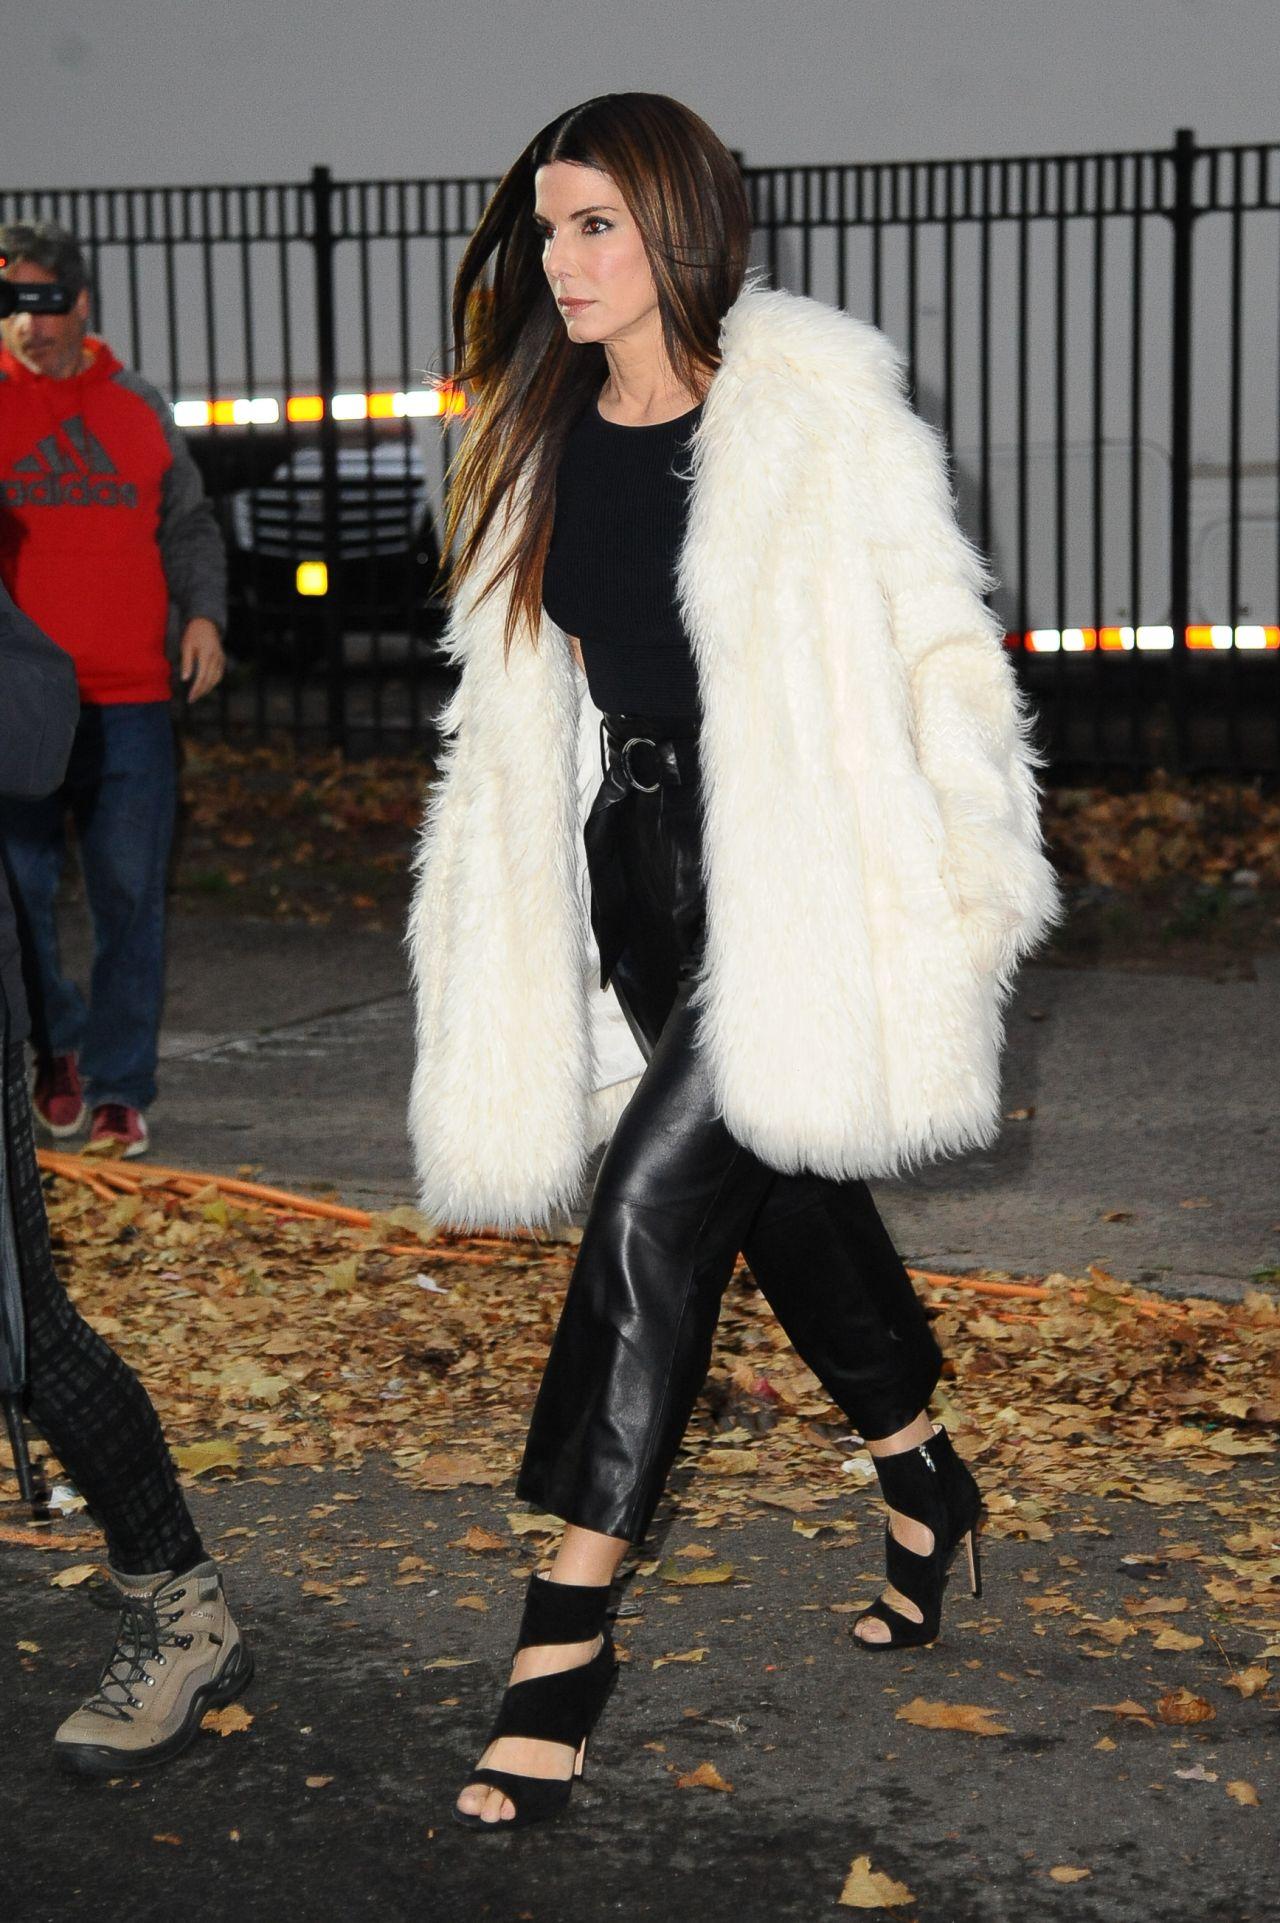 Sandra Bullock - Looking Fancy in Fur For 'Ocean's Eight' in